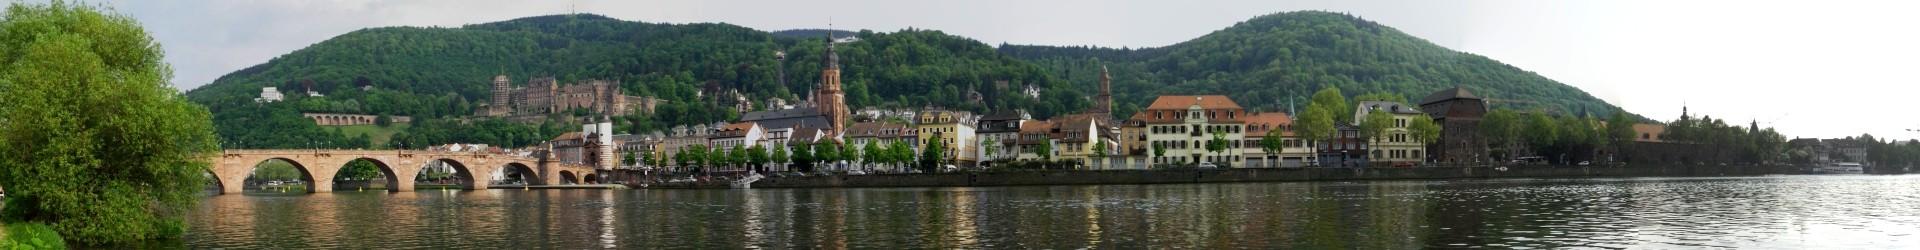 Maiwanderung mit e.s.v. SBV! Hercynia und e.s.v. V! Alt-Heidelbergerinnen D